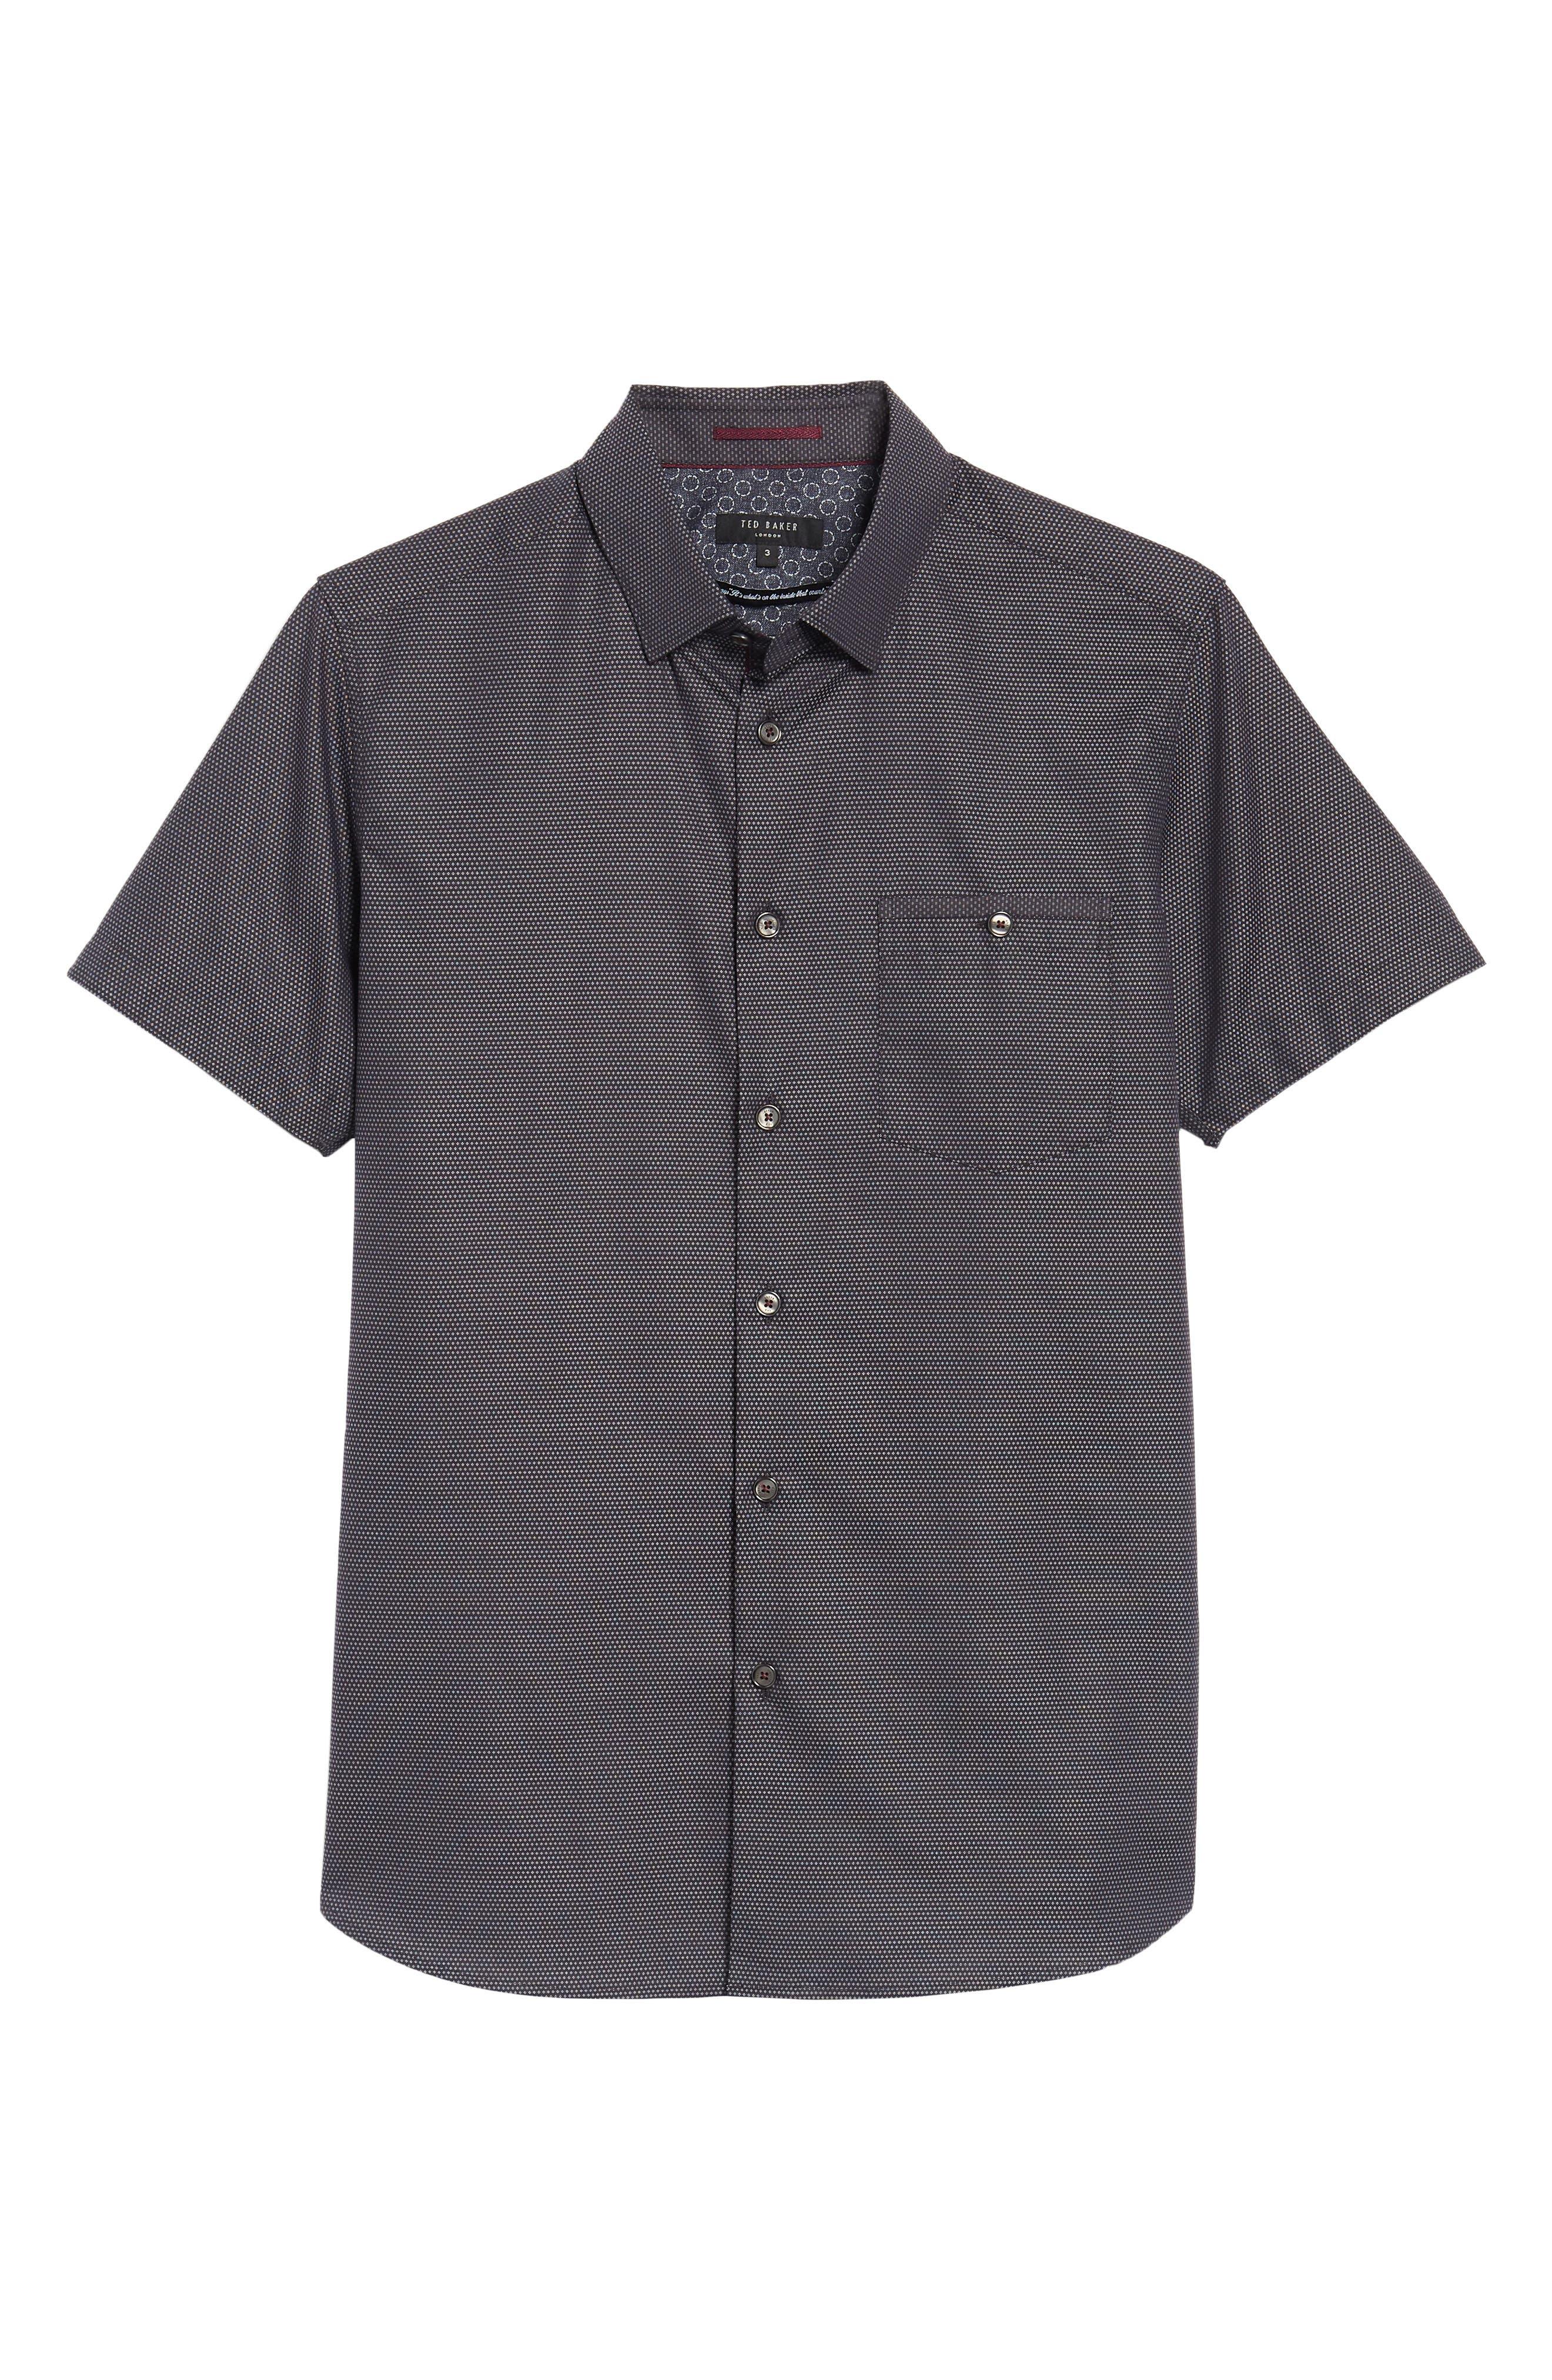 Dotdots Trim Fit Dot Short Sleeve Sport Shirt,                             Alternate thumbnail 6, color,                             001